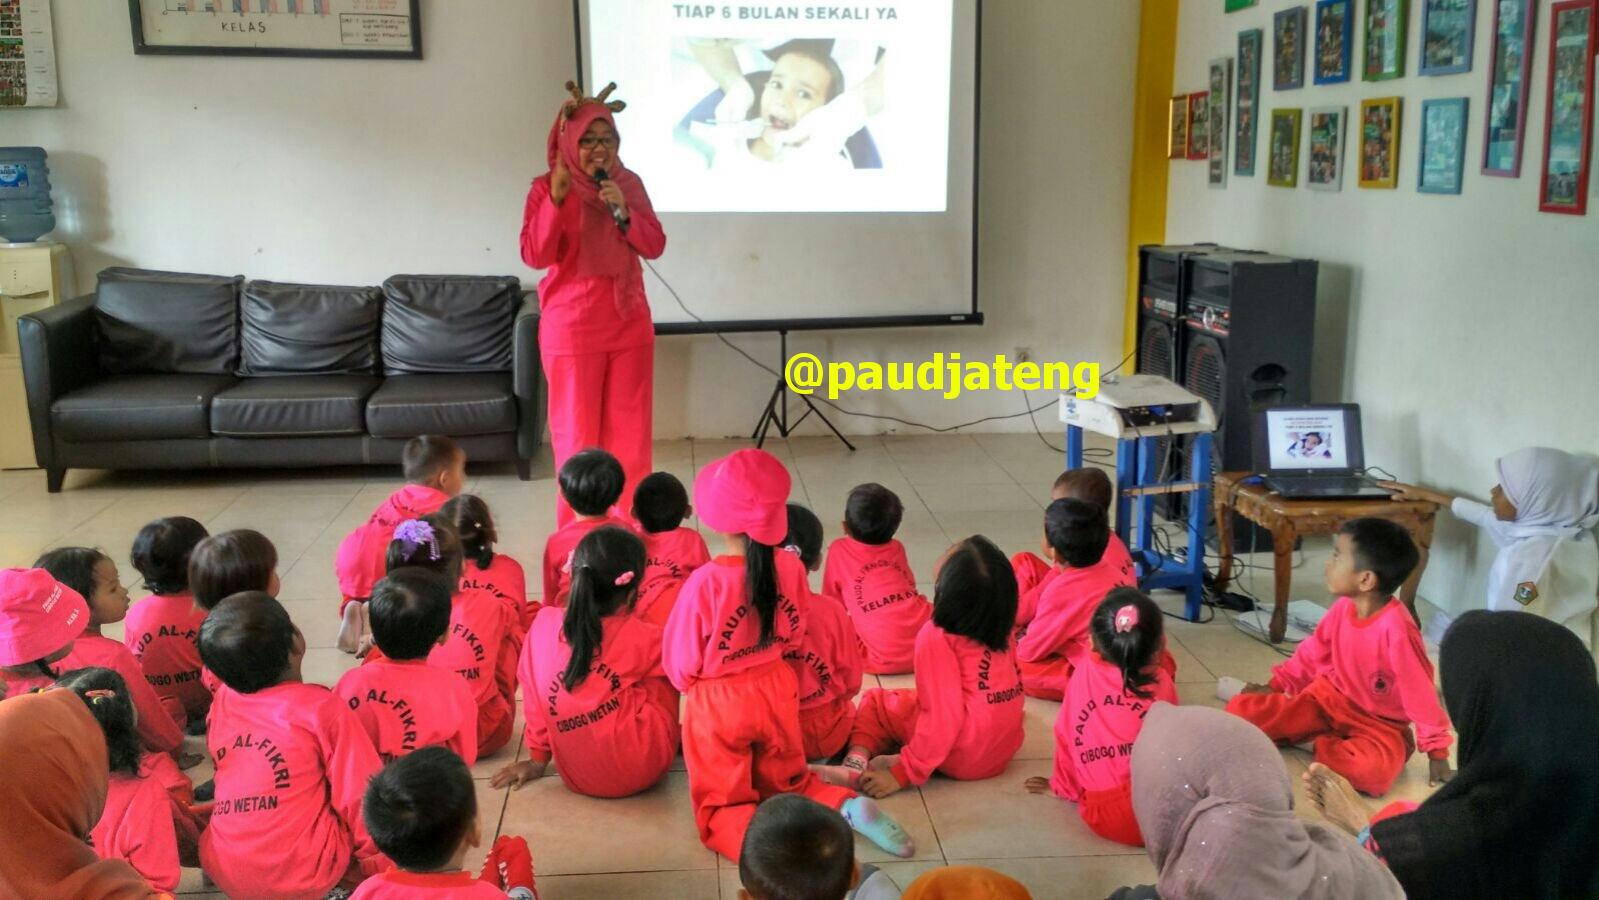 Bagaimana Cara Pengelolaan Pembelajaran Di Paud Jateng Buku Panduan Belajar Mengelola